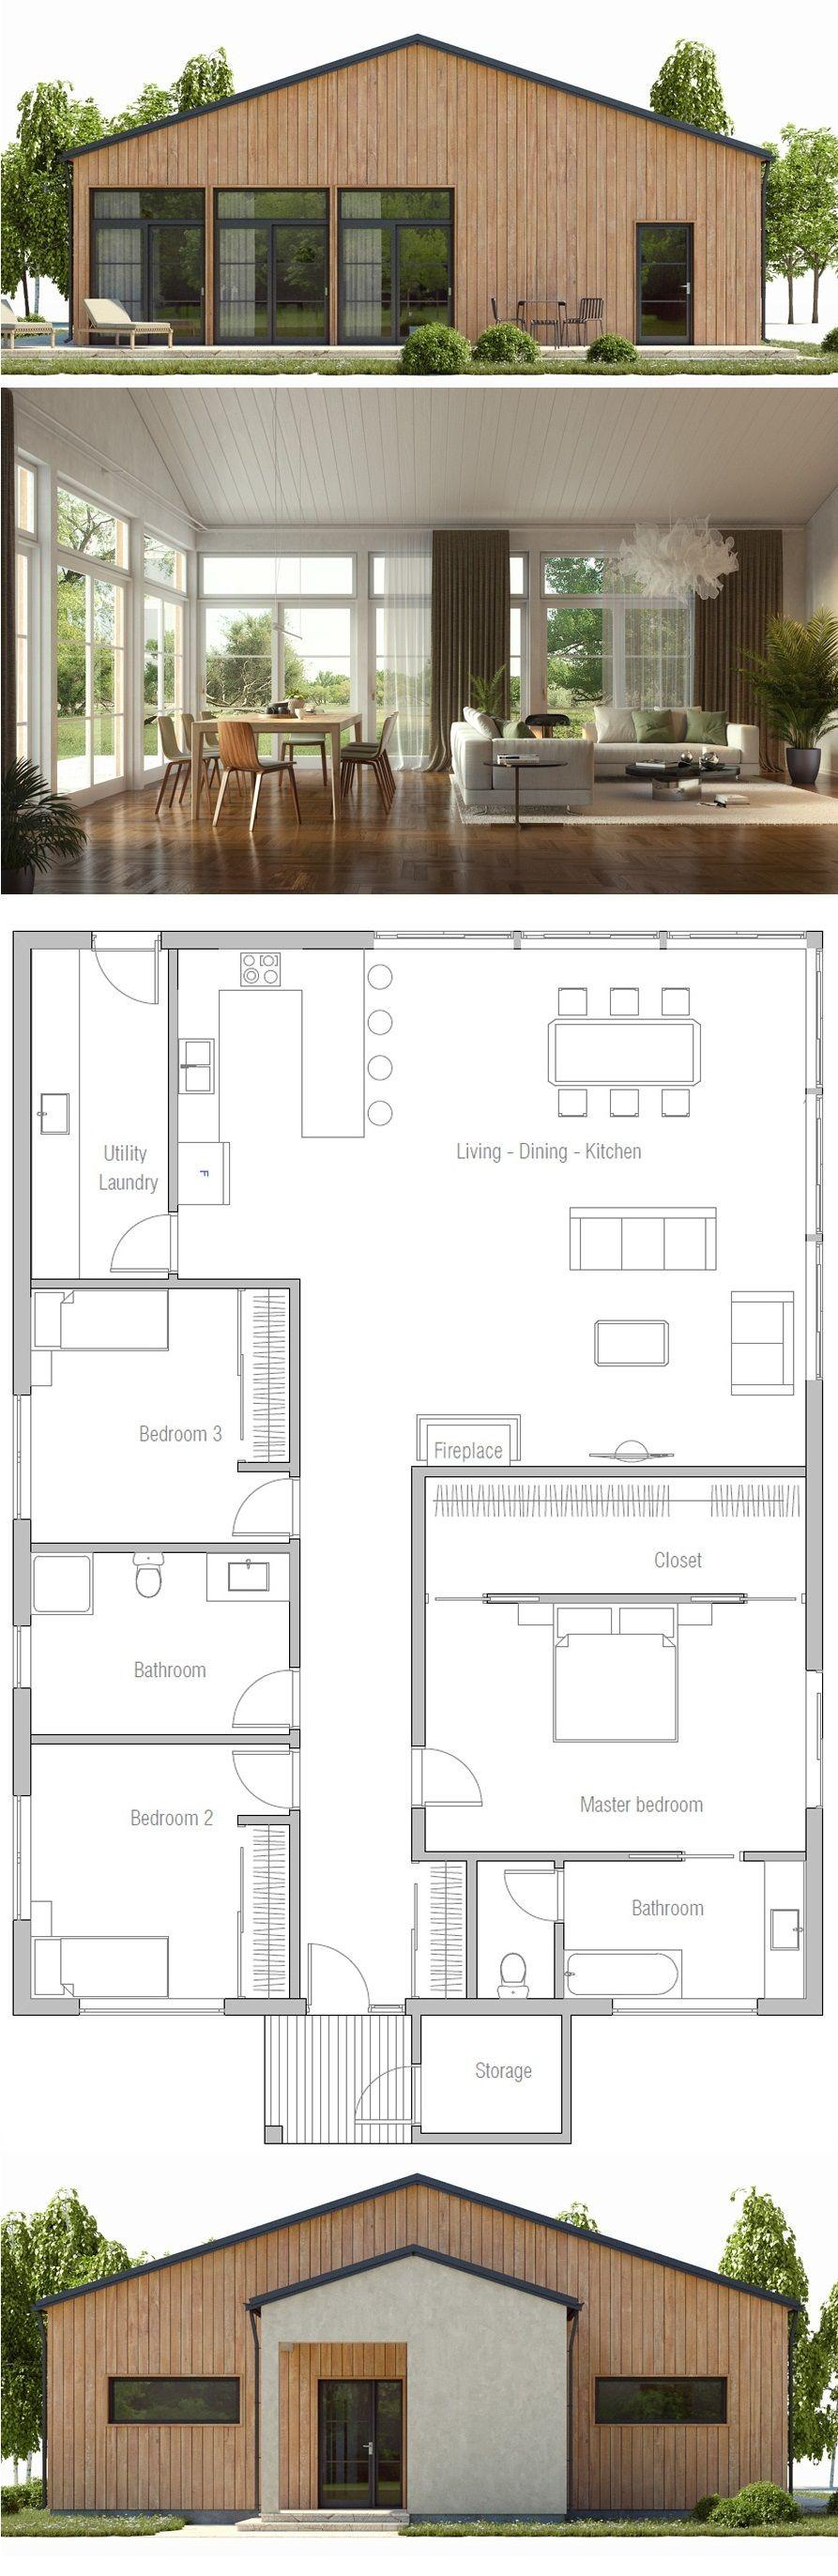 2 schlafzimmer pool haus grundrisse albufeira bungalow schlafzimmer badezimmer houses plans in 2018